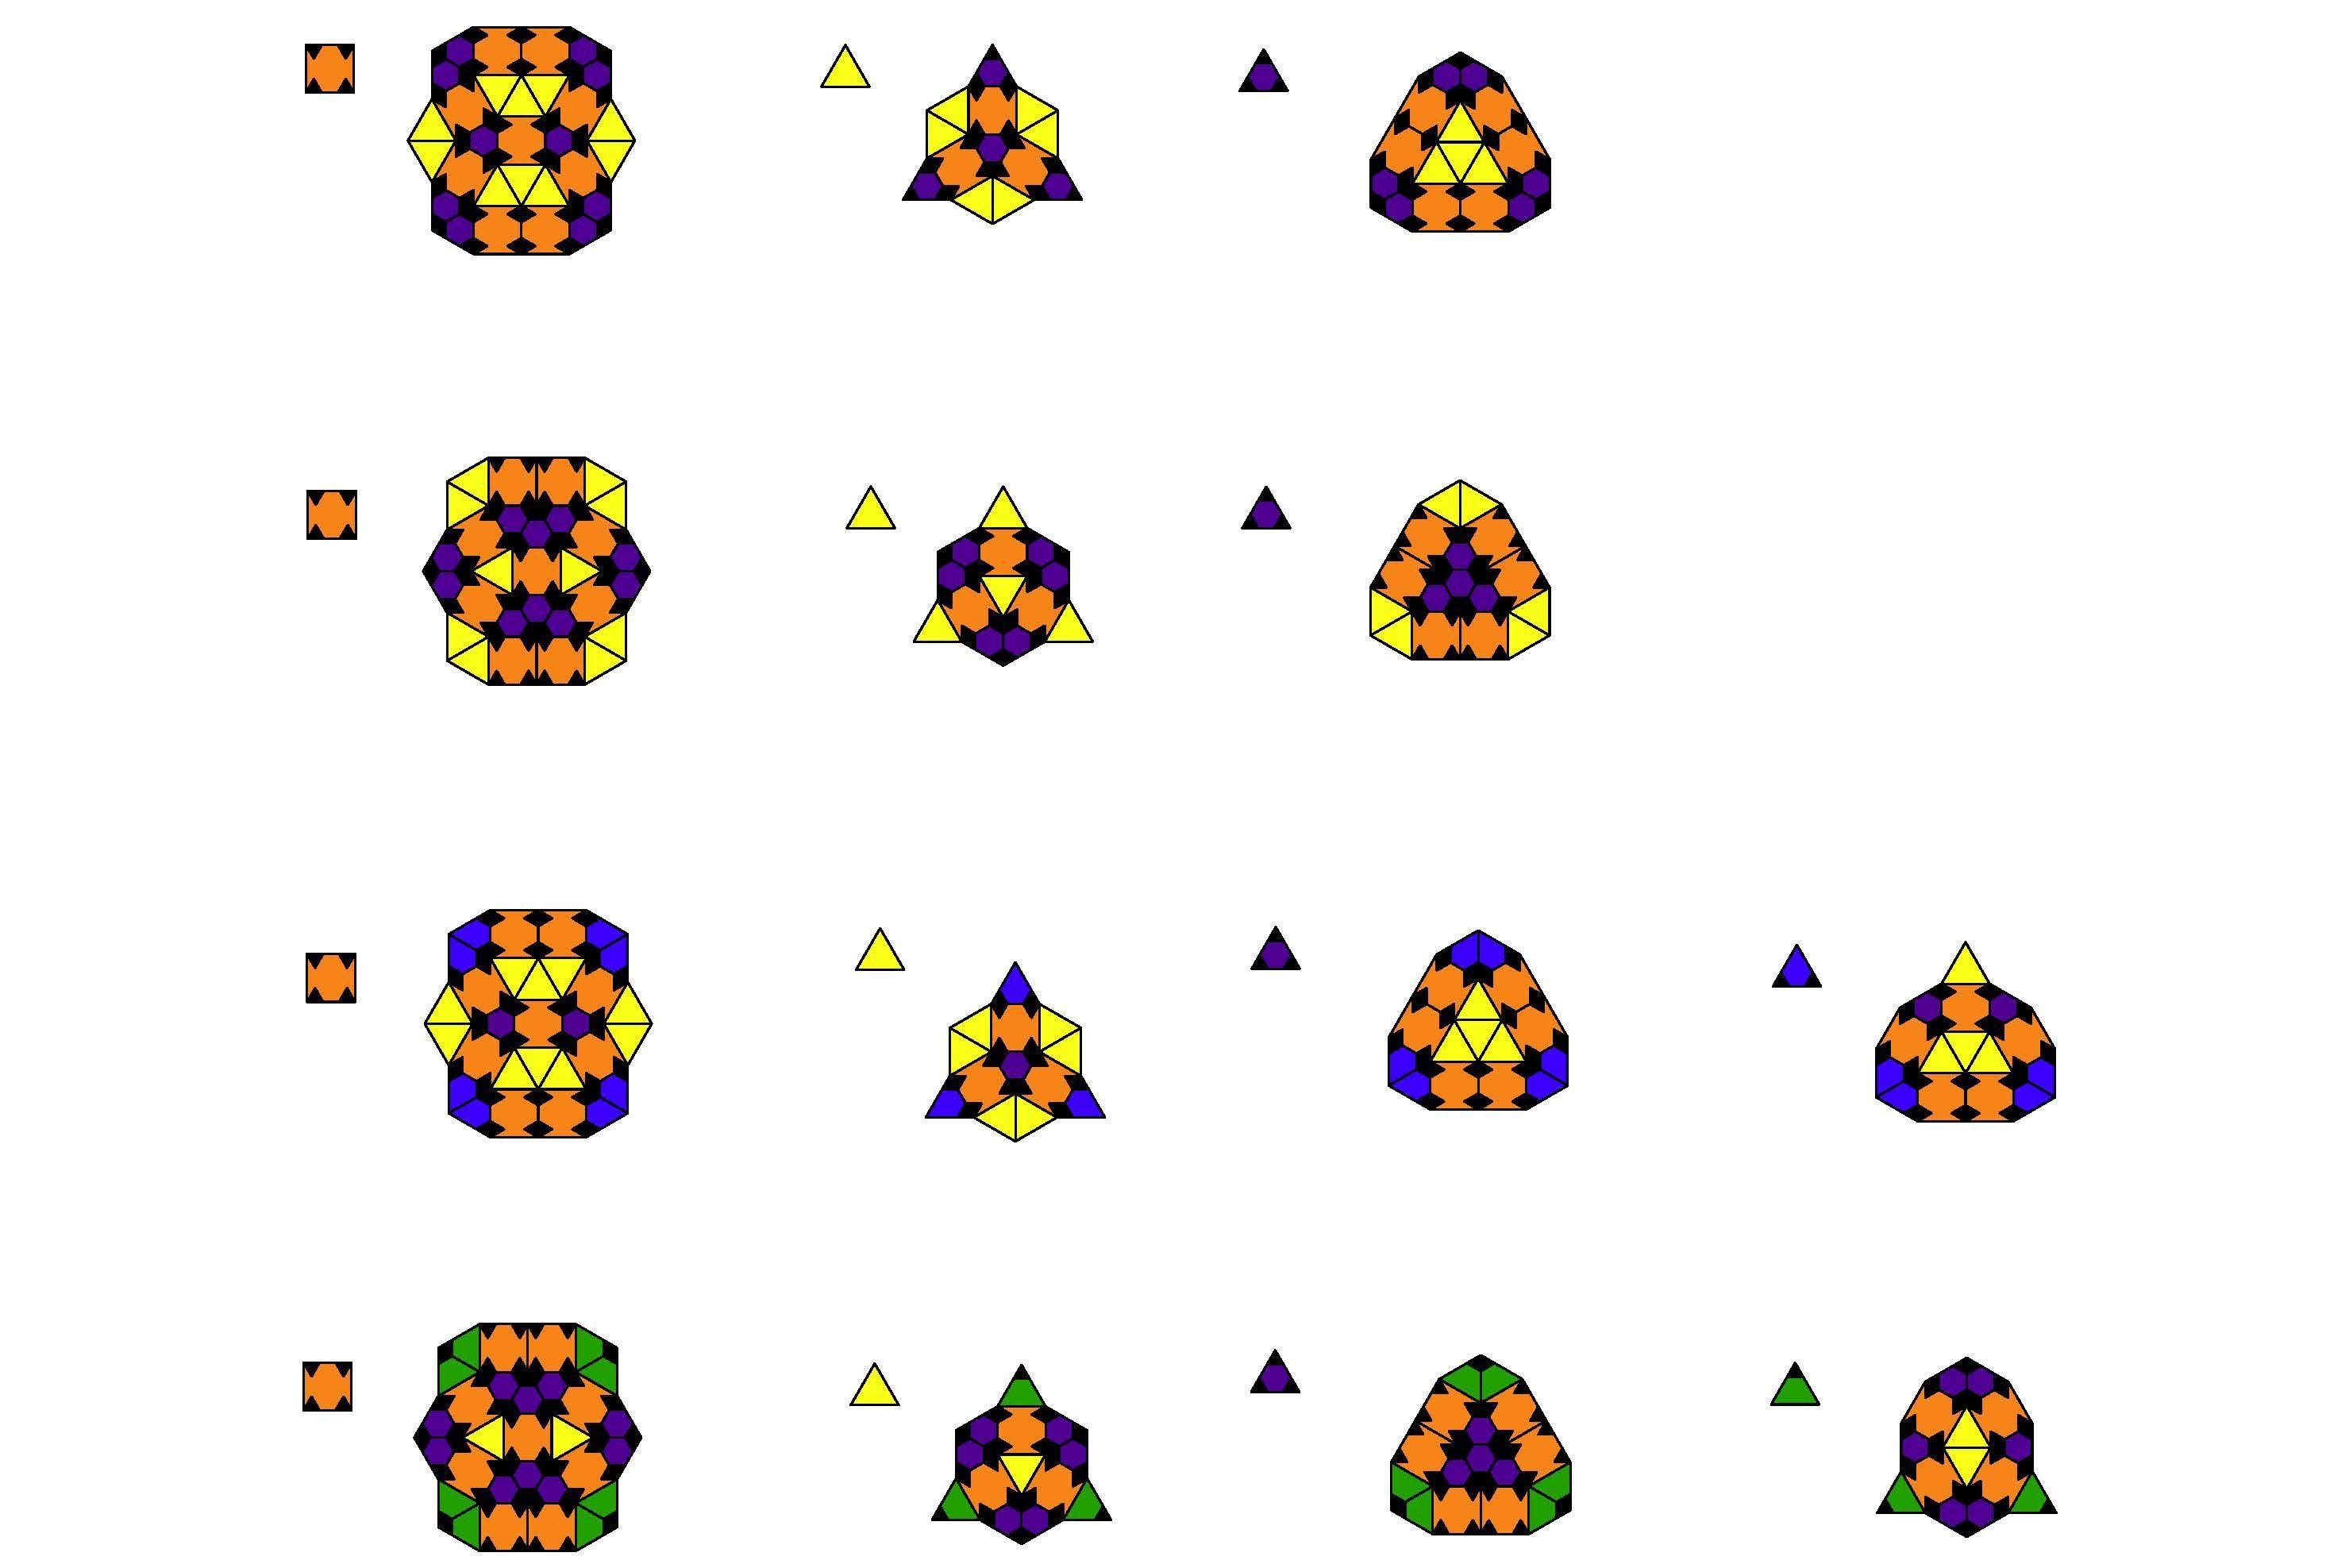 Substitution rules for four nonperiodic squaretriangle